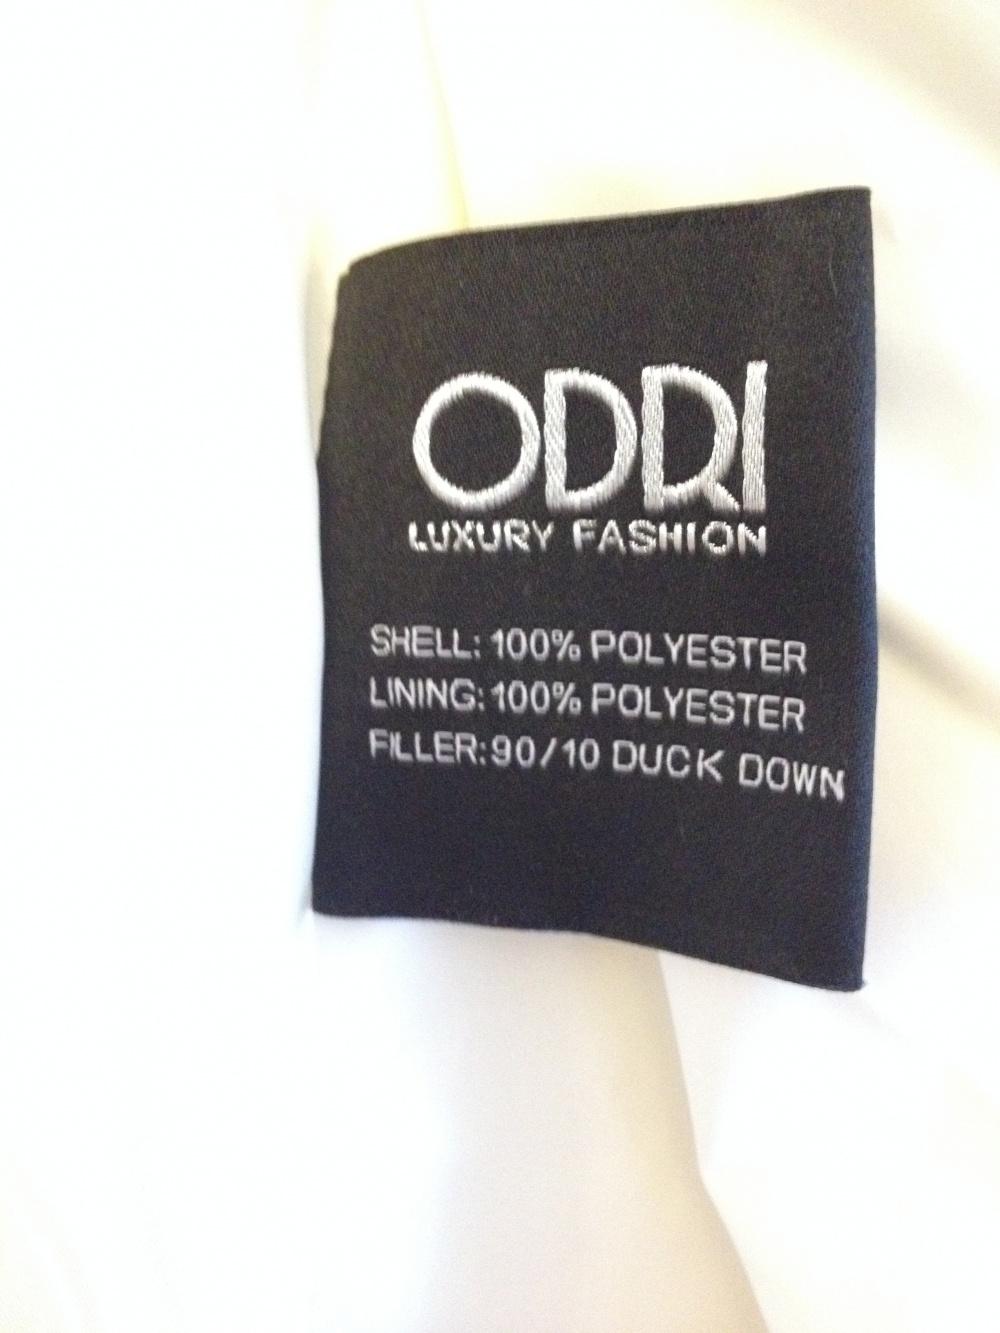 Пуховик ODRI модель Ines, новый, размер 40 it, молочного цвета